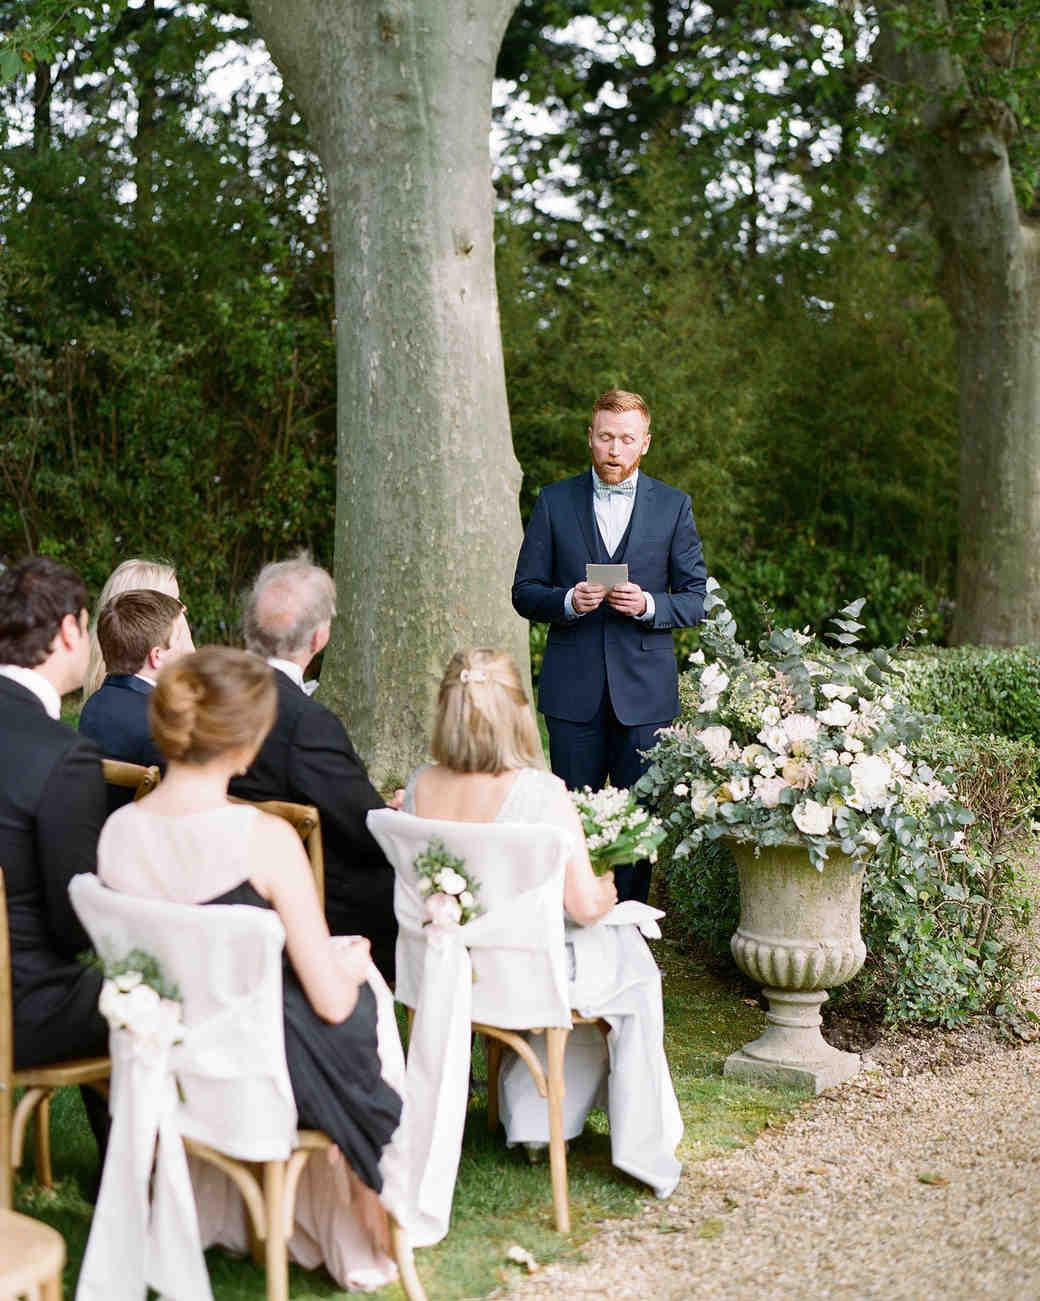 julie-chris-wedding-reading-0966-s12649-0216.jpg